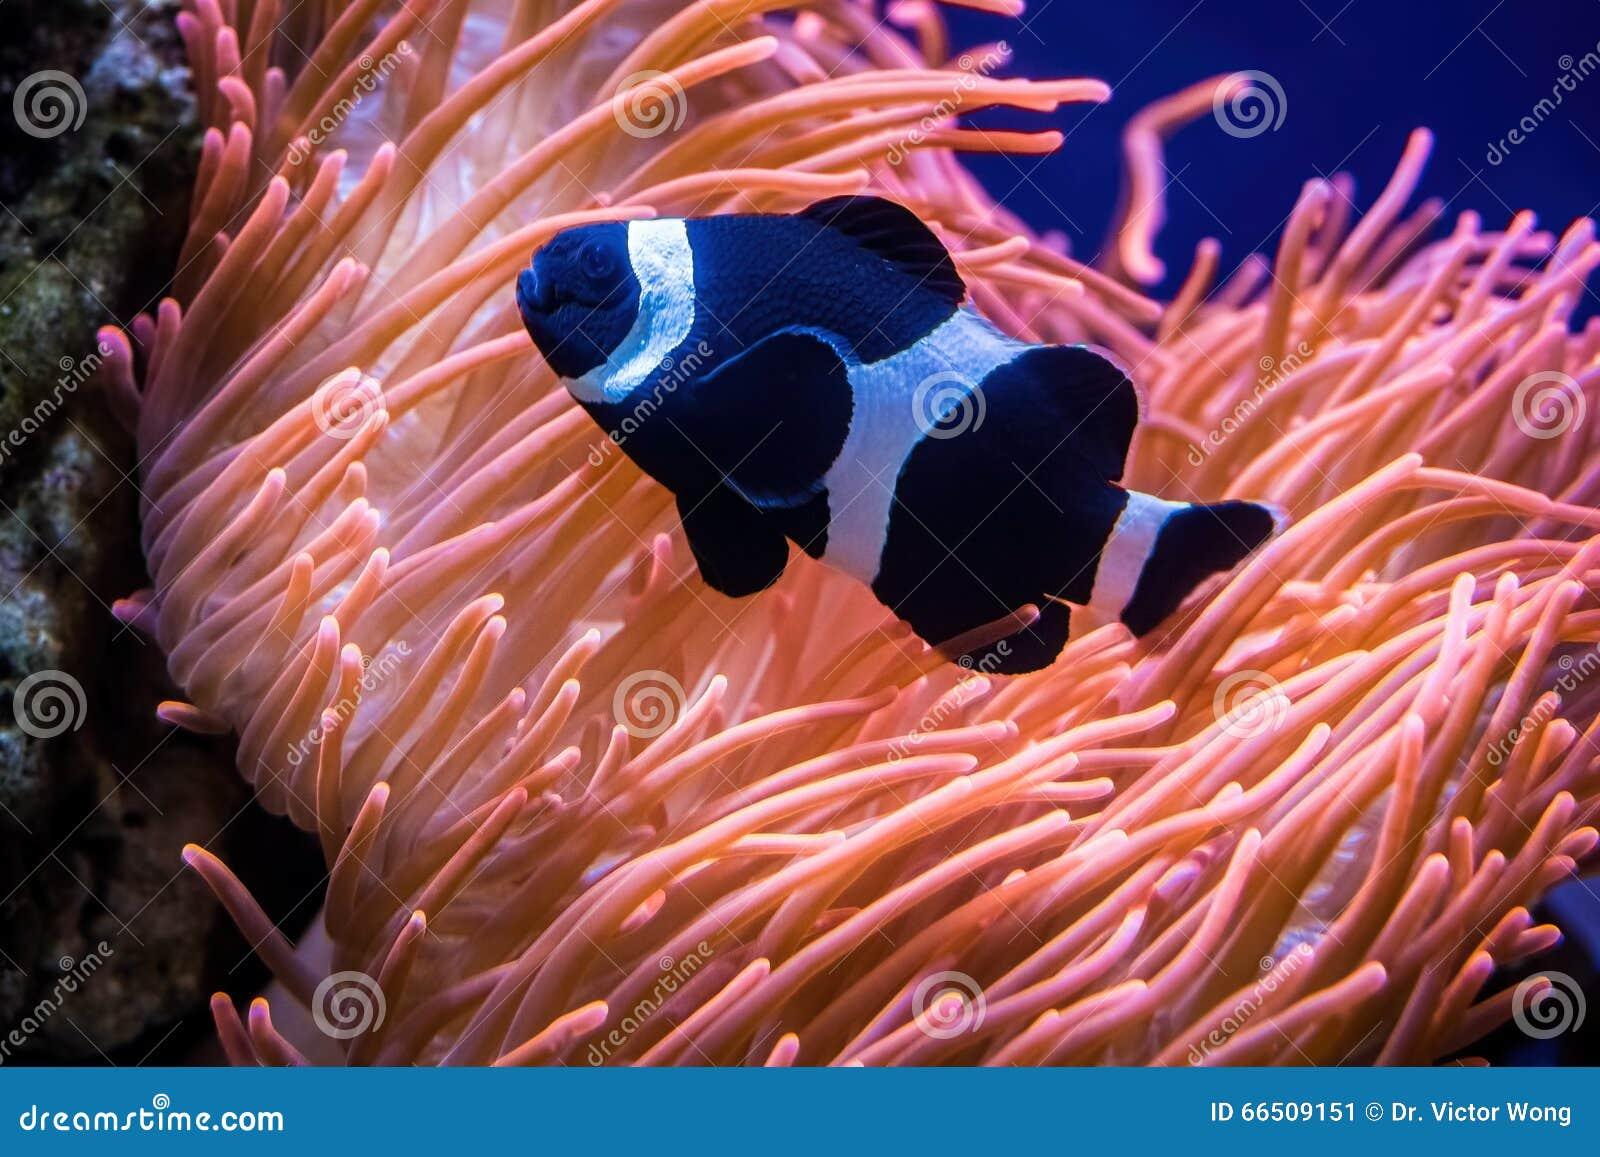 Sea Anemone And Black Clown Fish Stock Image - Image of clownfish ...